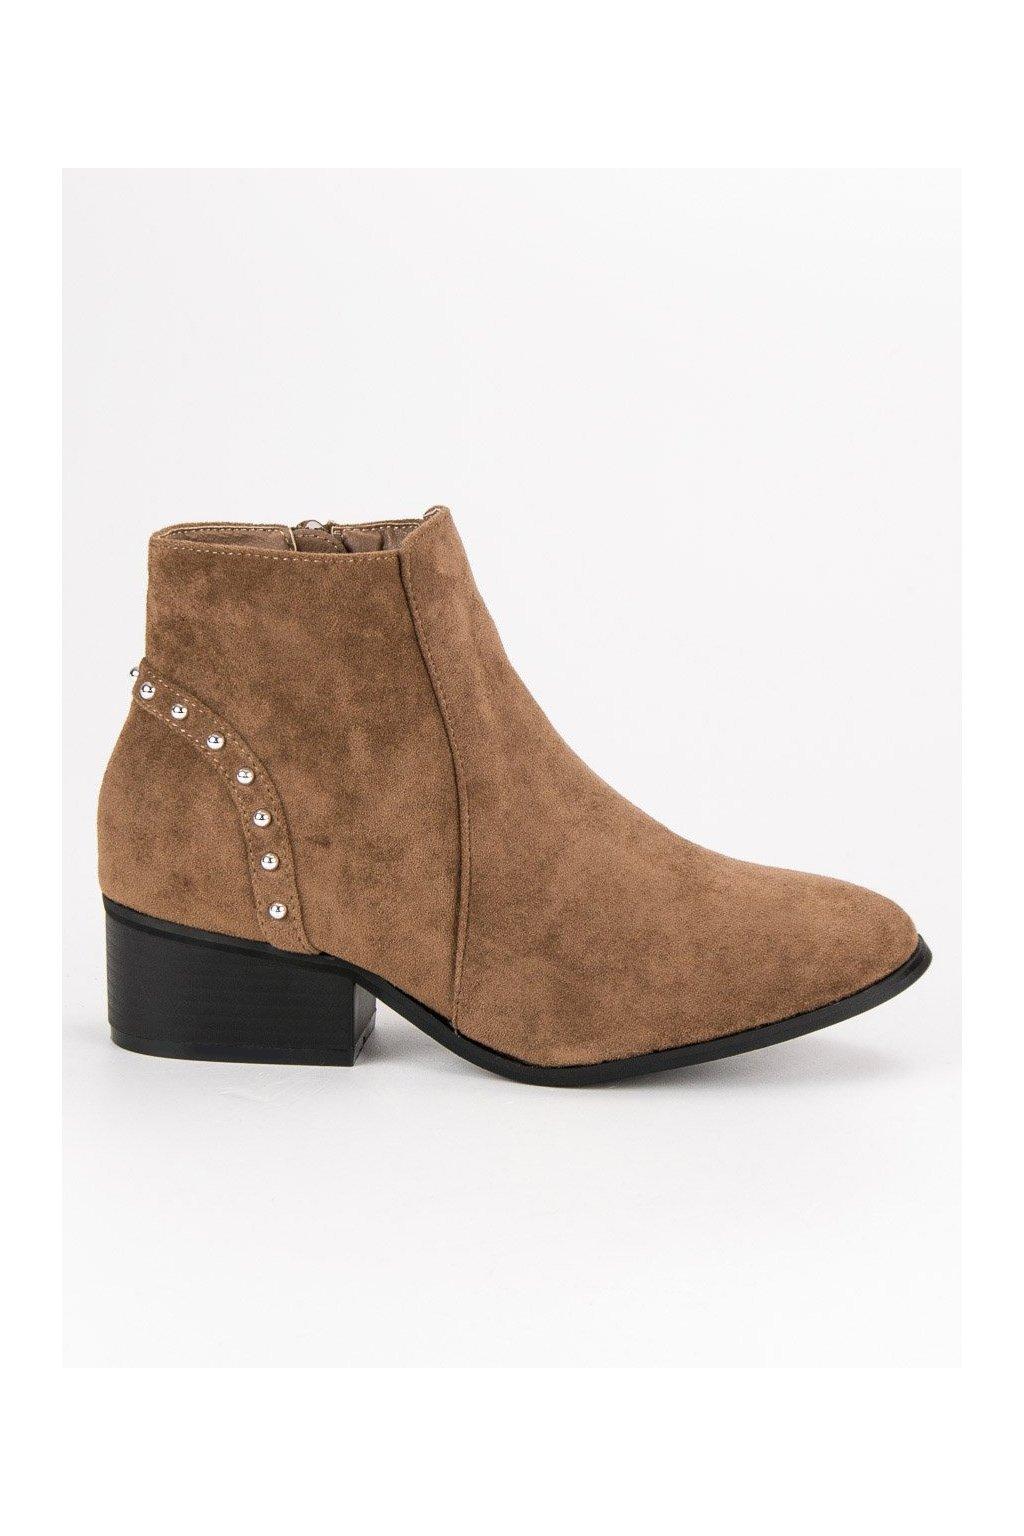 f6fdf22f7fe0 Béžové semišové topánky casual CnB AB8160KH